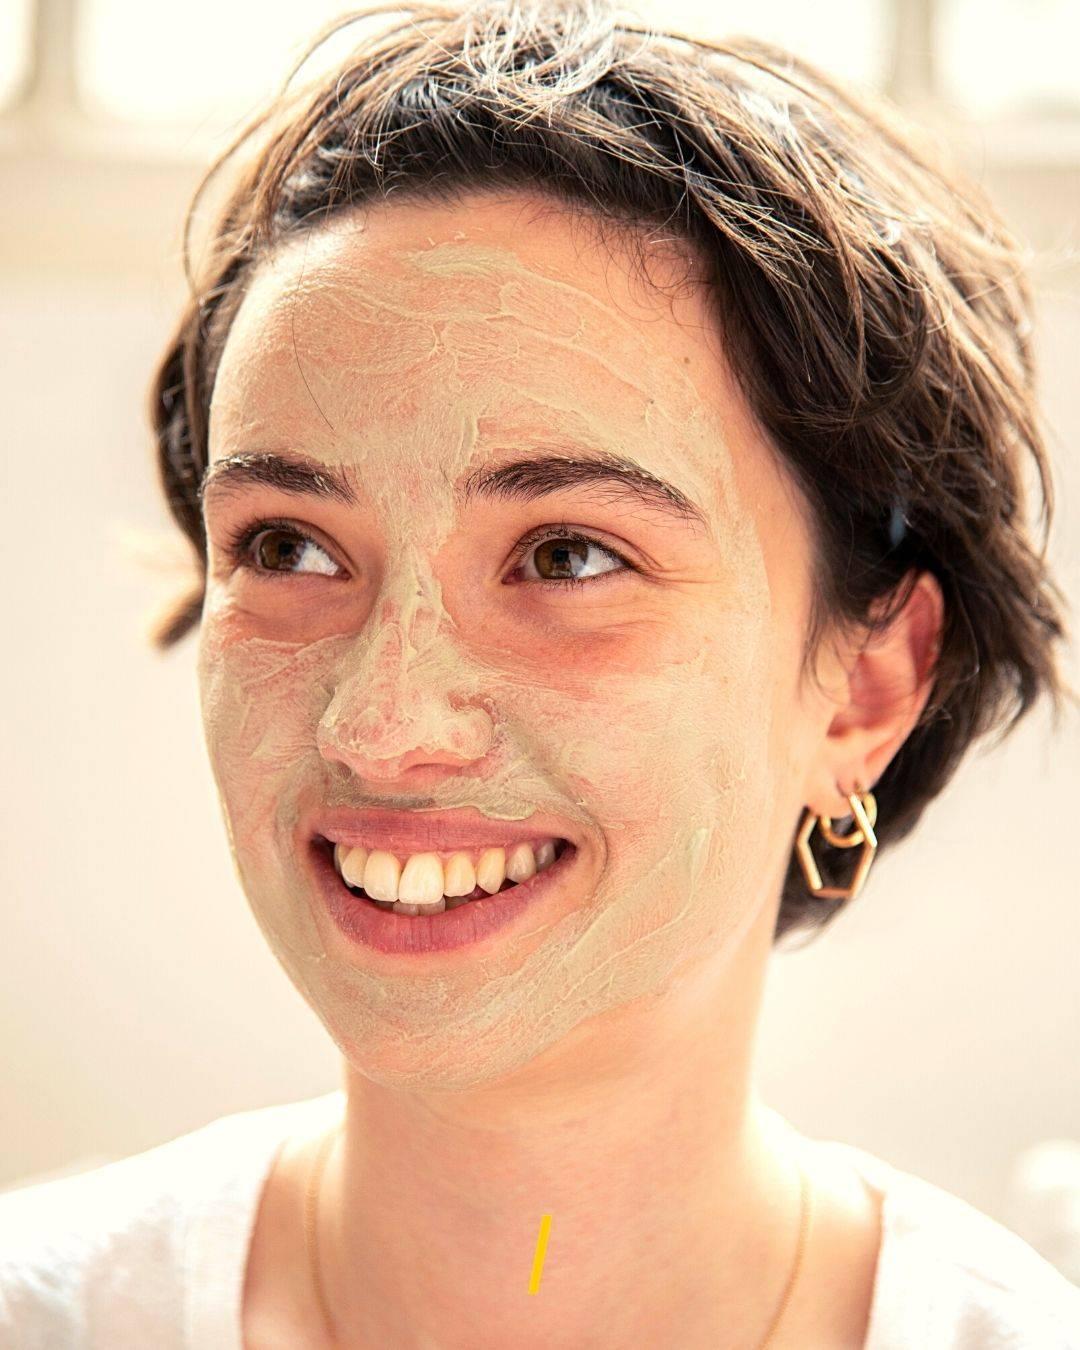 Masque visage - Argile verte